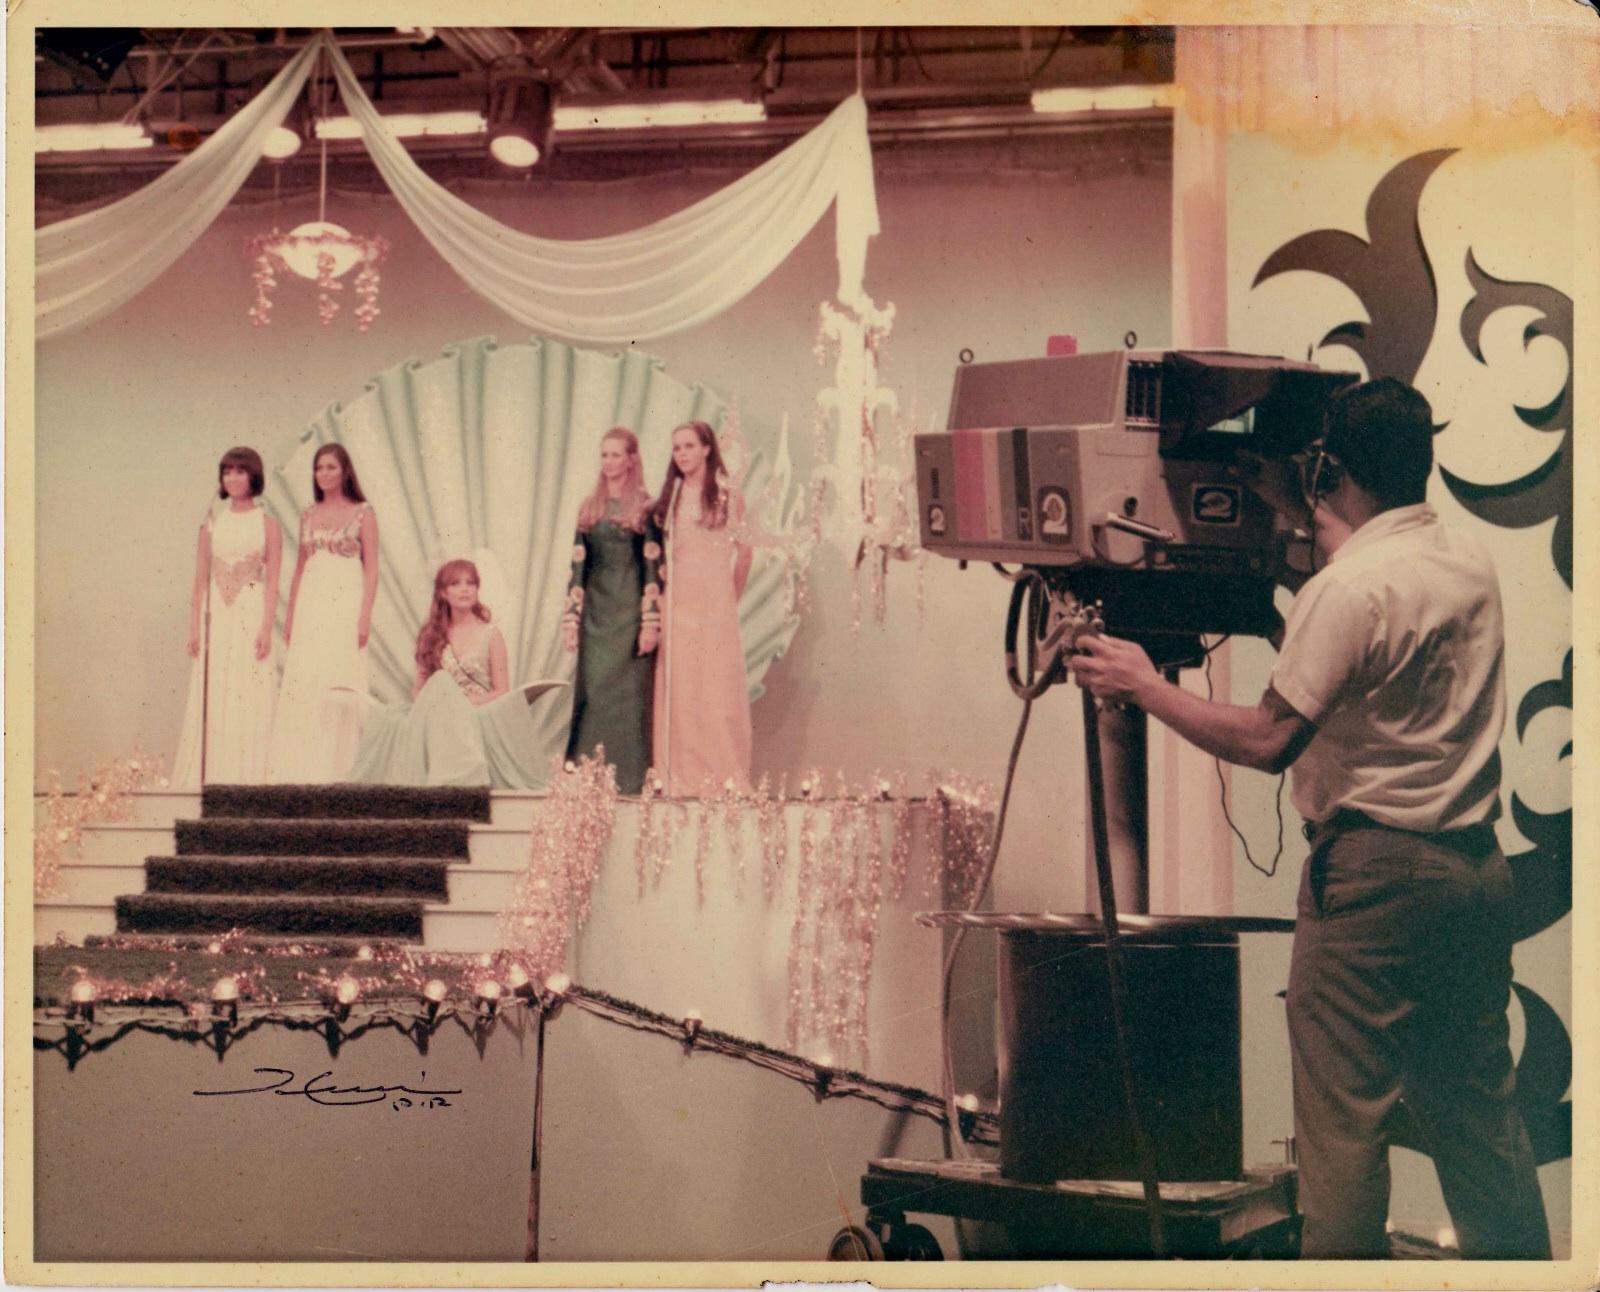 marisol malaret, miss universe 1970. - Página 3 Mvlral10